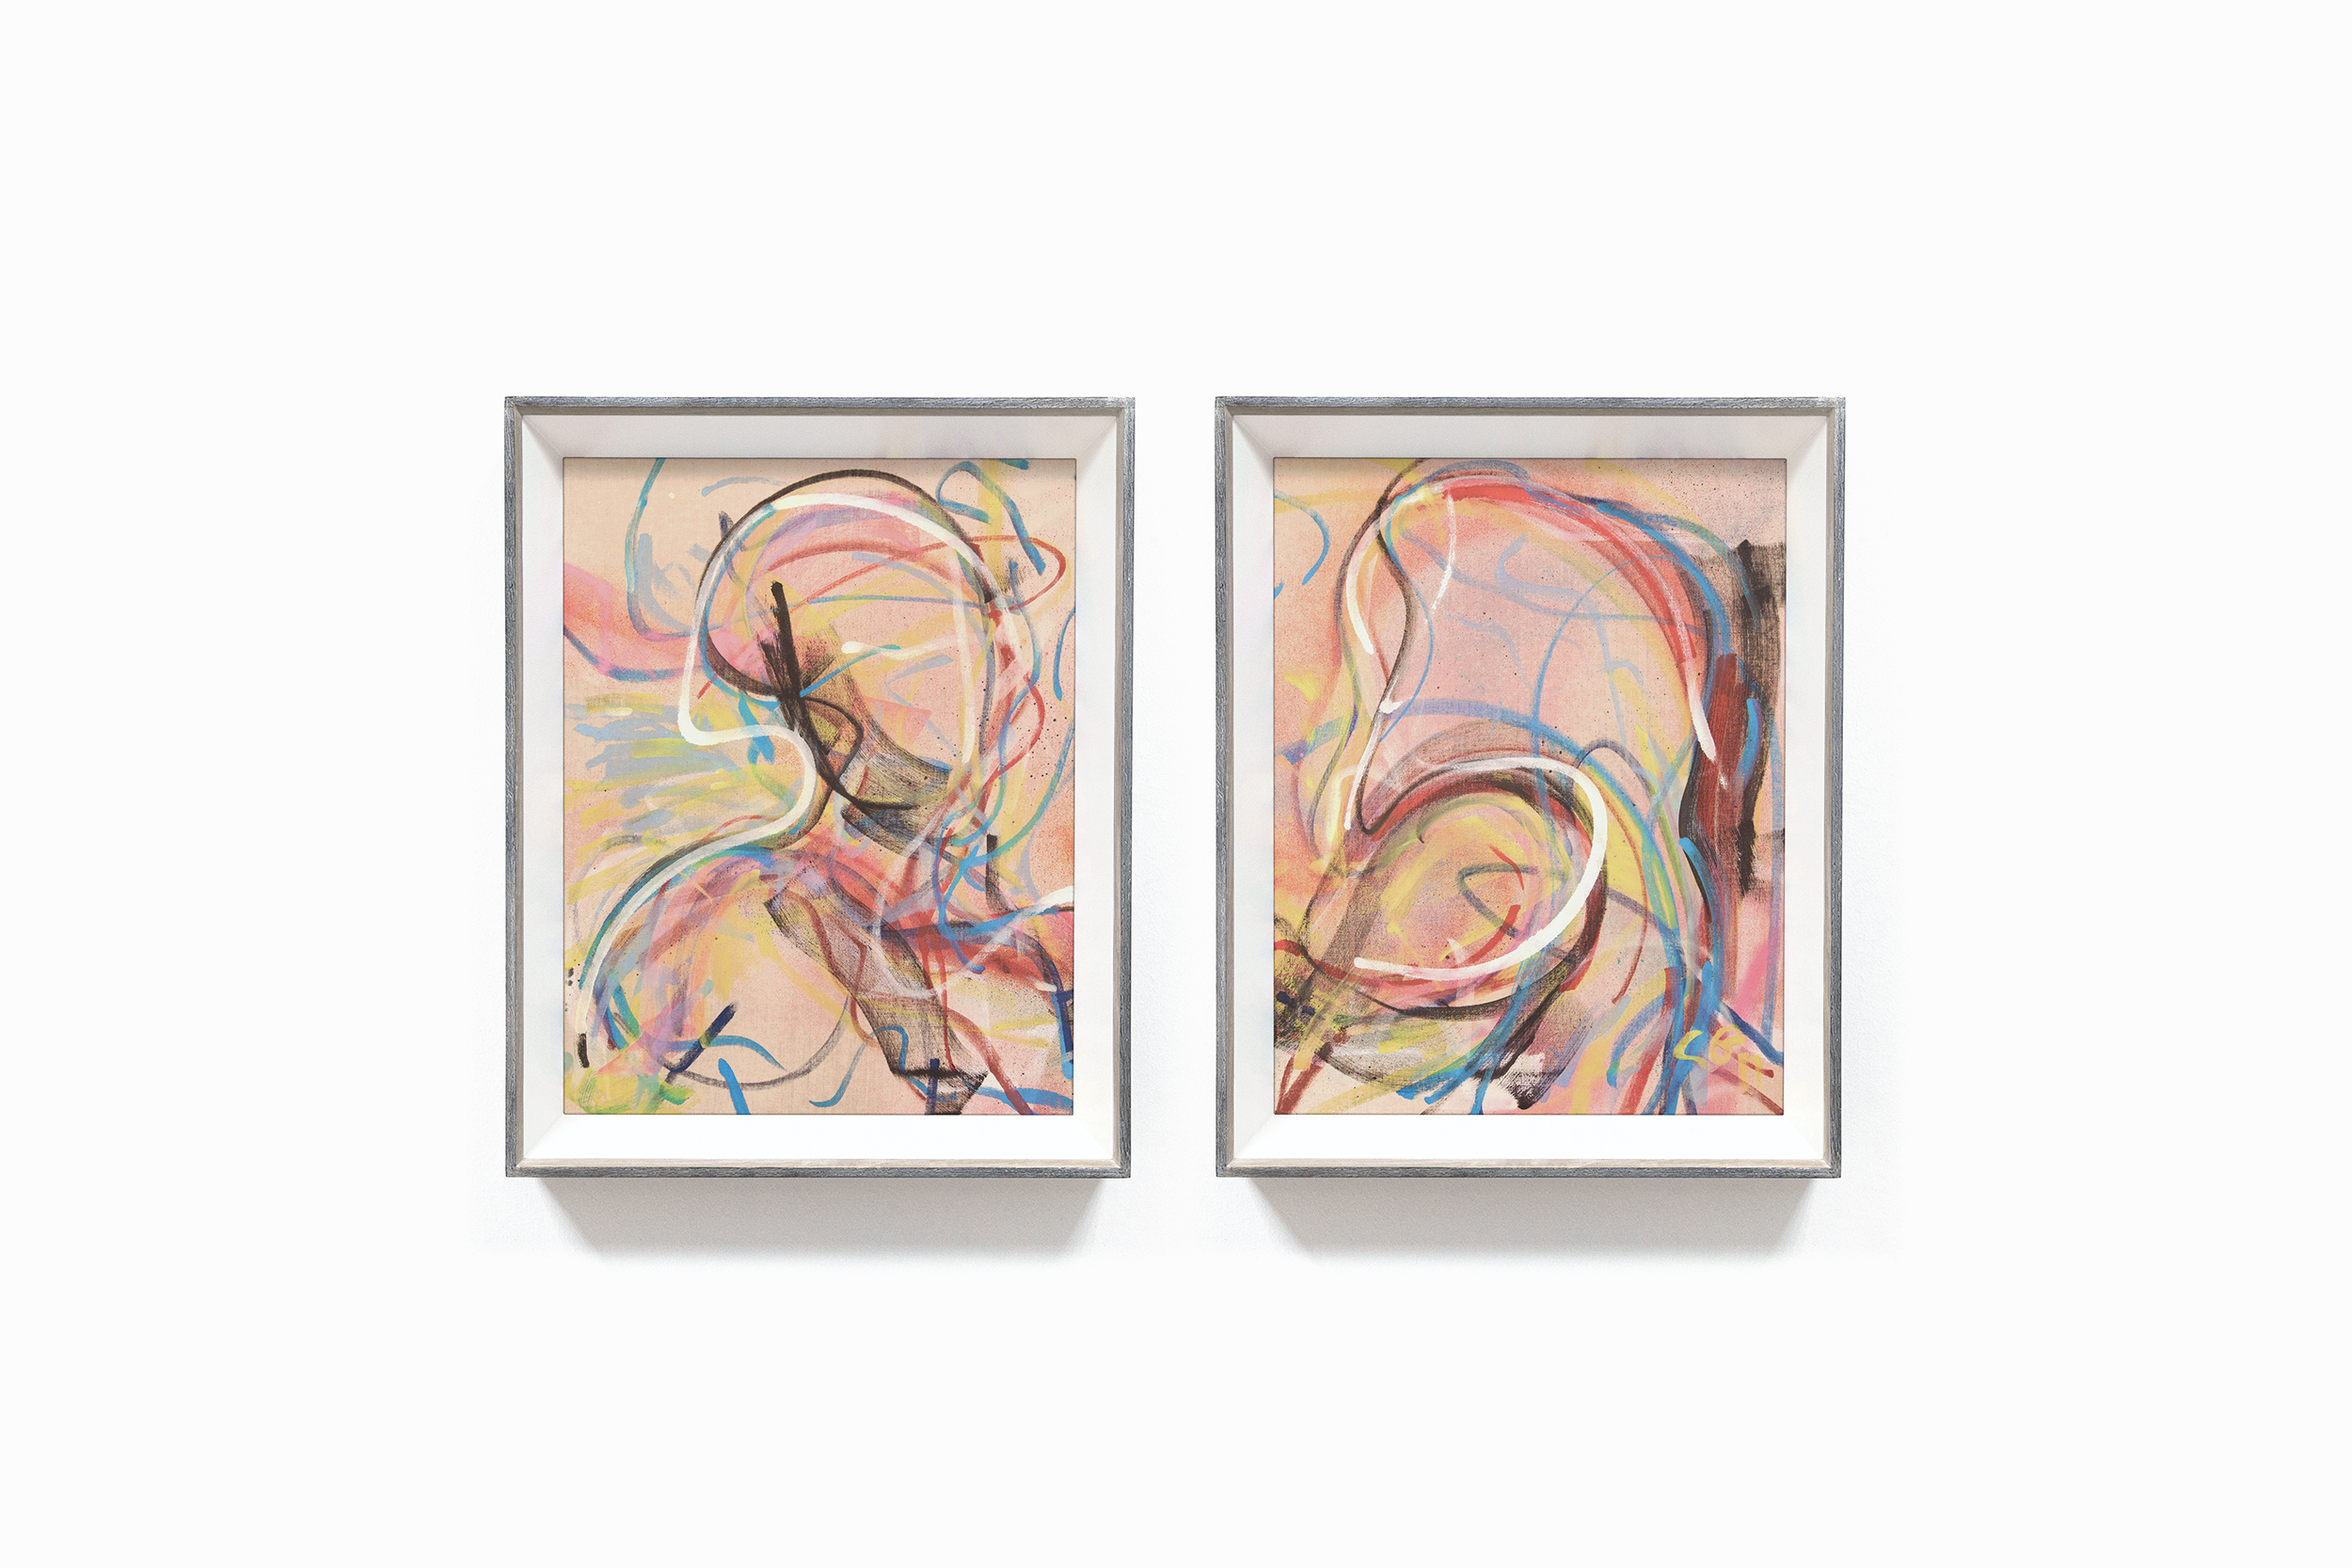 bonjourmolotov+Ambulante+Illustration+Ilustracao+painting+pintura+acrylic+acrílico+canvas+tela+paper+cardboard+mdf+Andre+Gigante+Luis+Gigante+02BN12.jpg